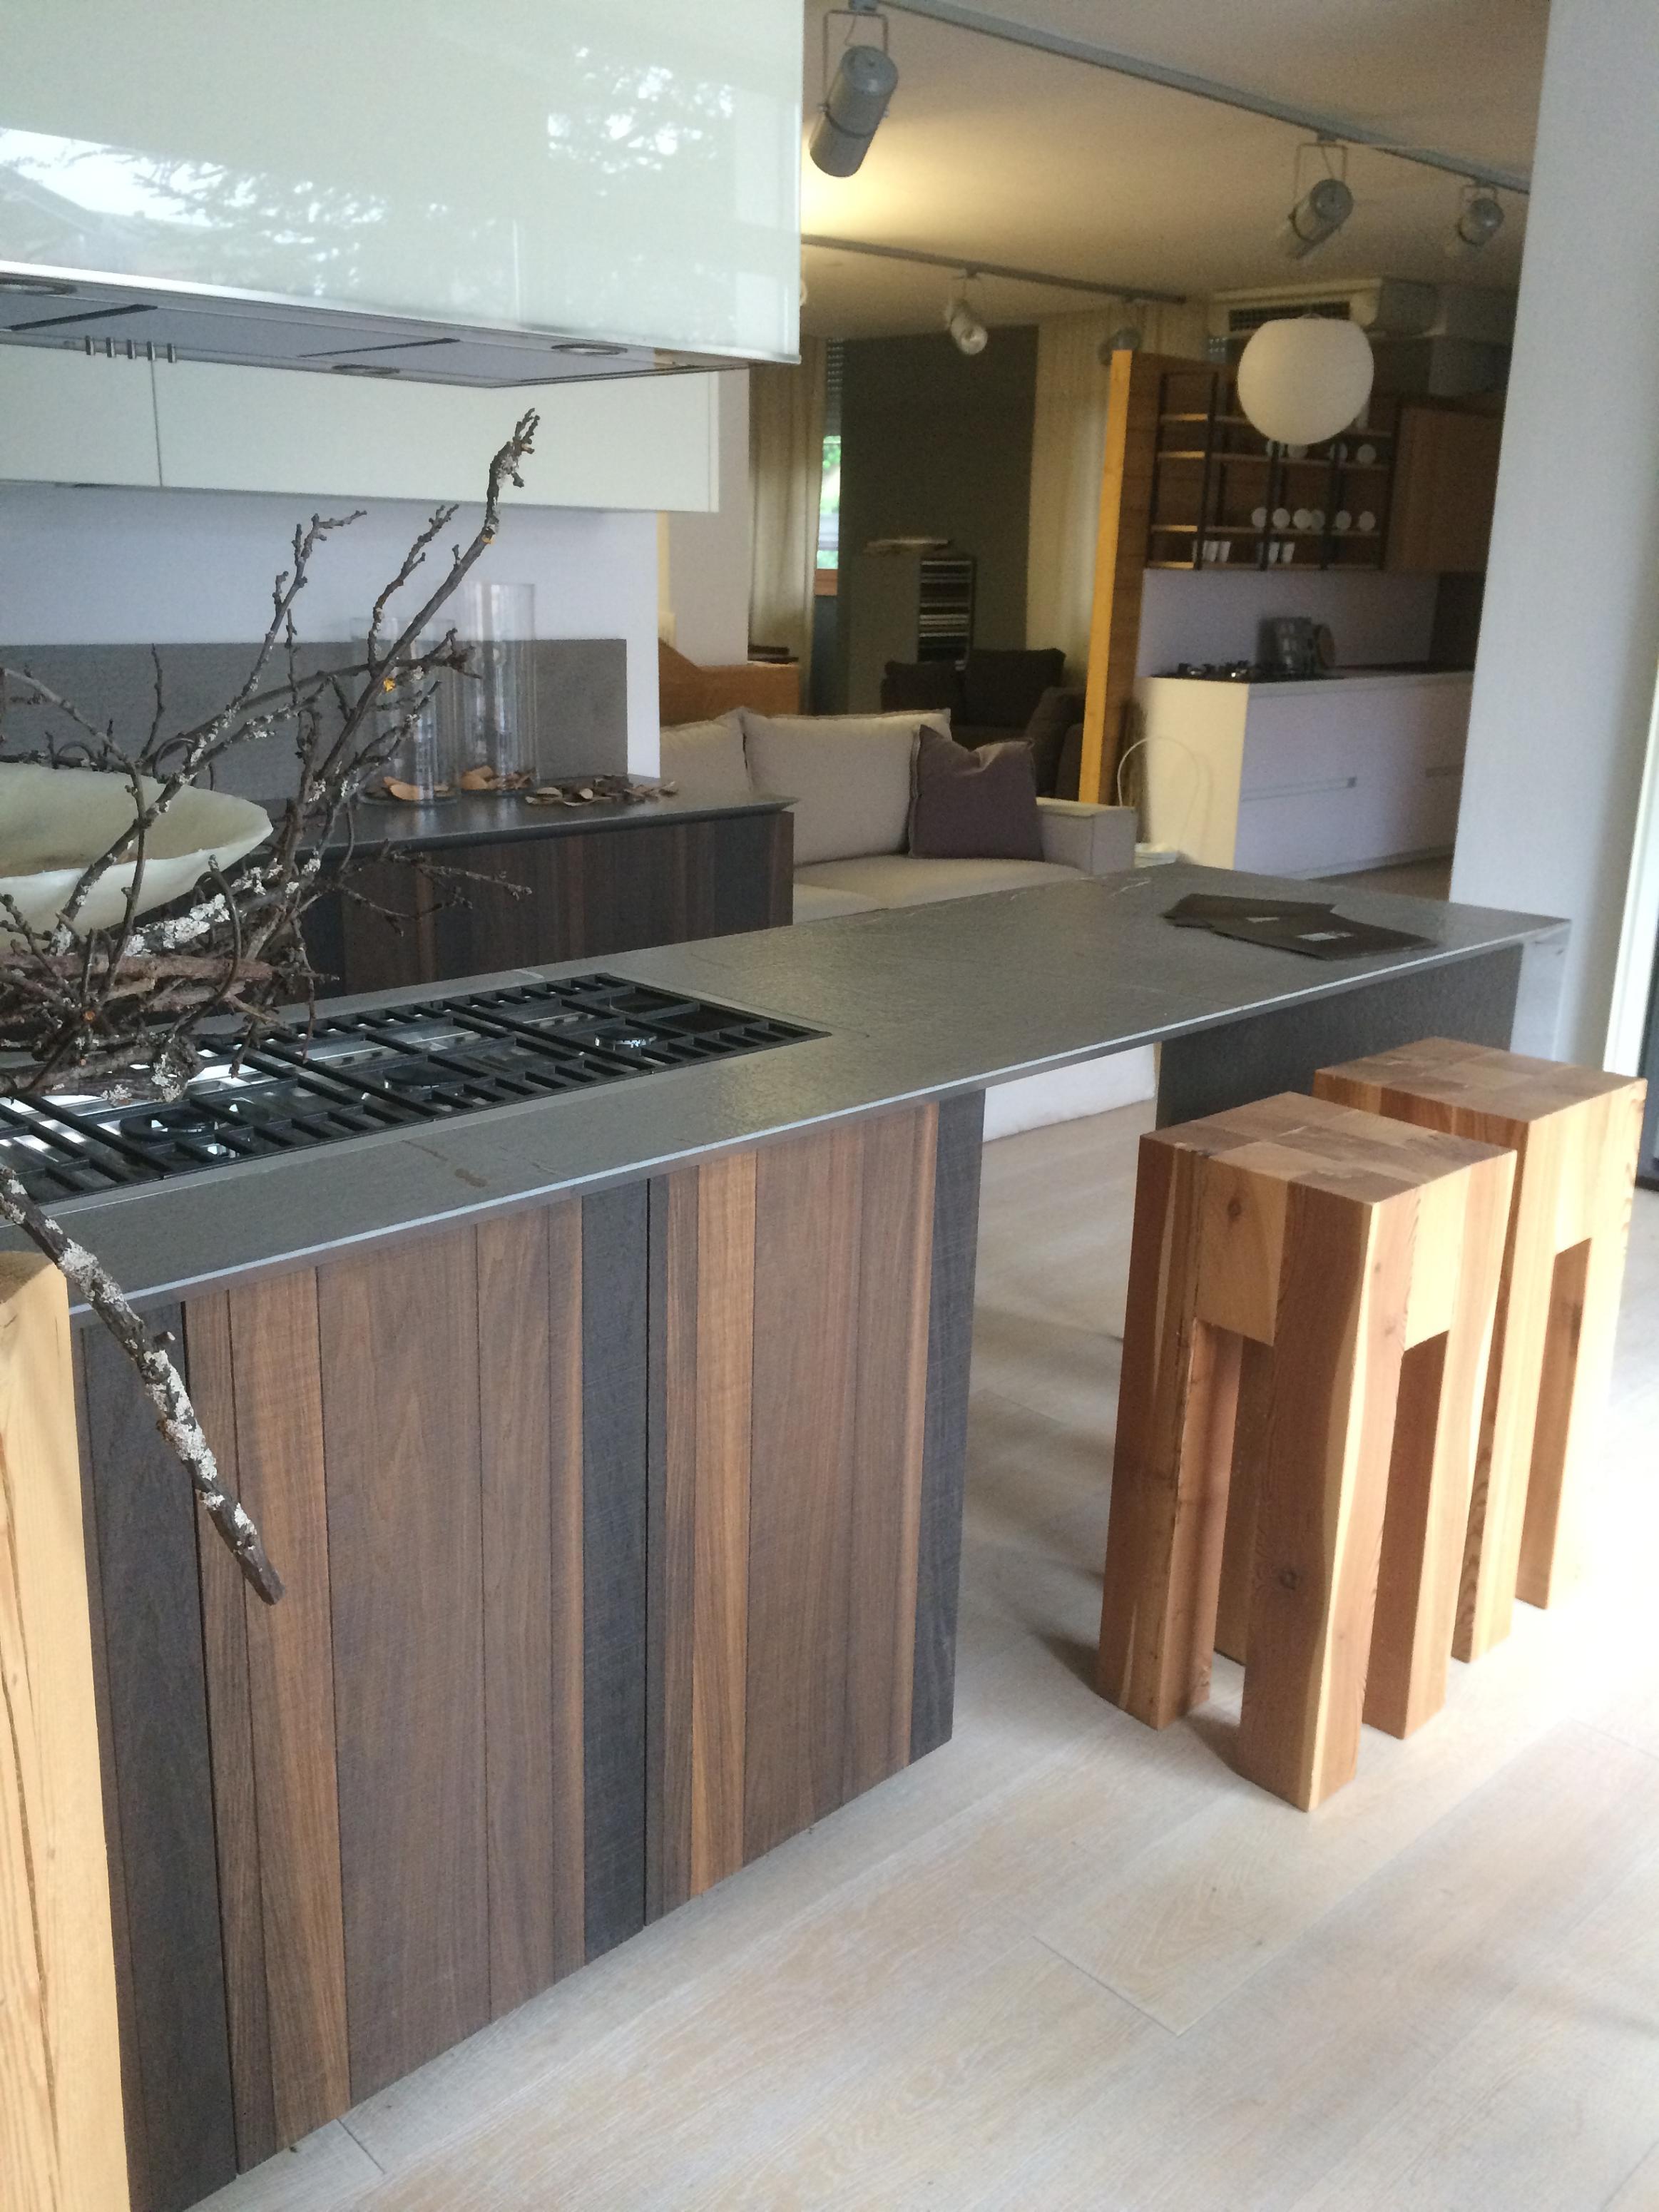 Cucina zampieri a isola in rovere termico scontatissima - Cucine in rovere ...